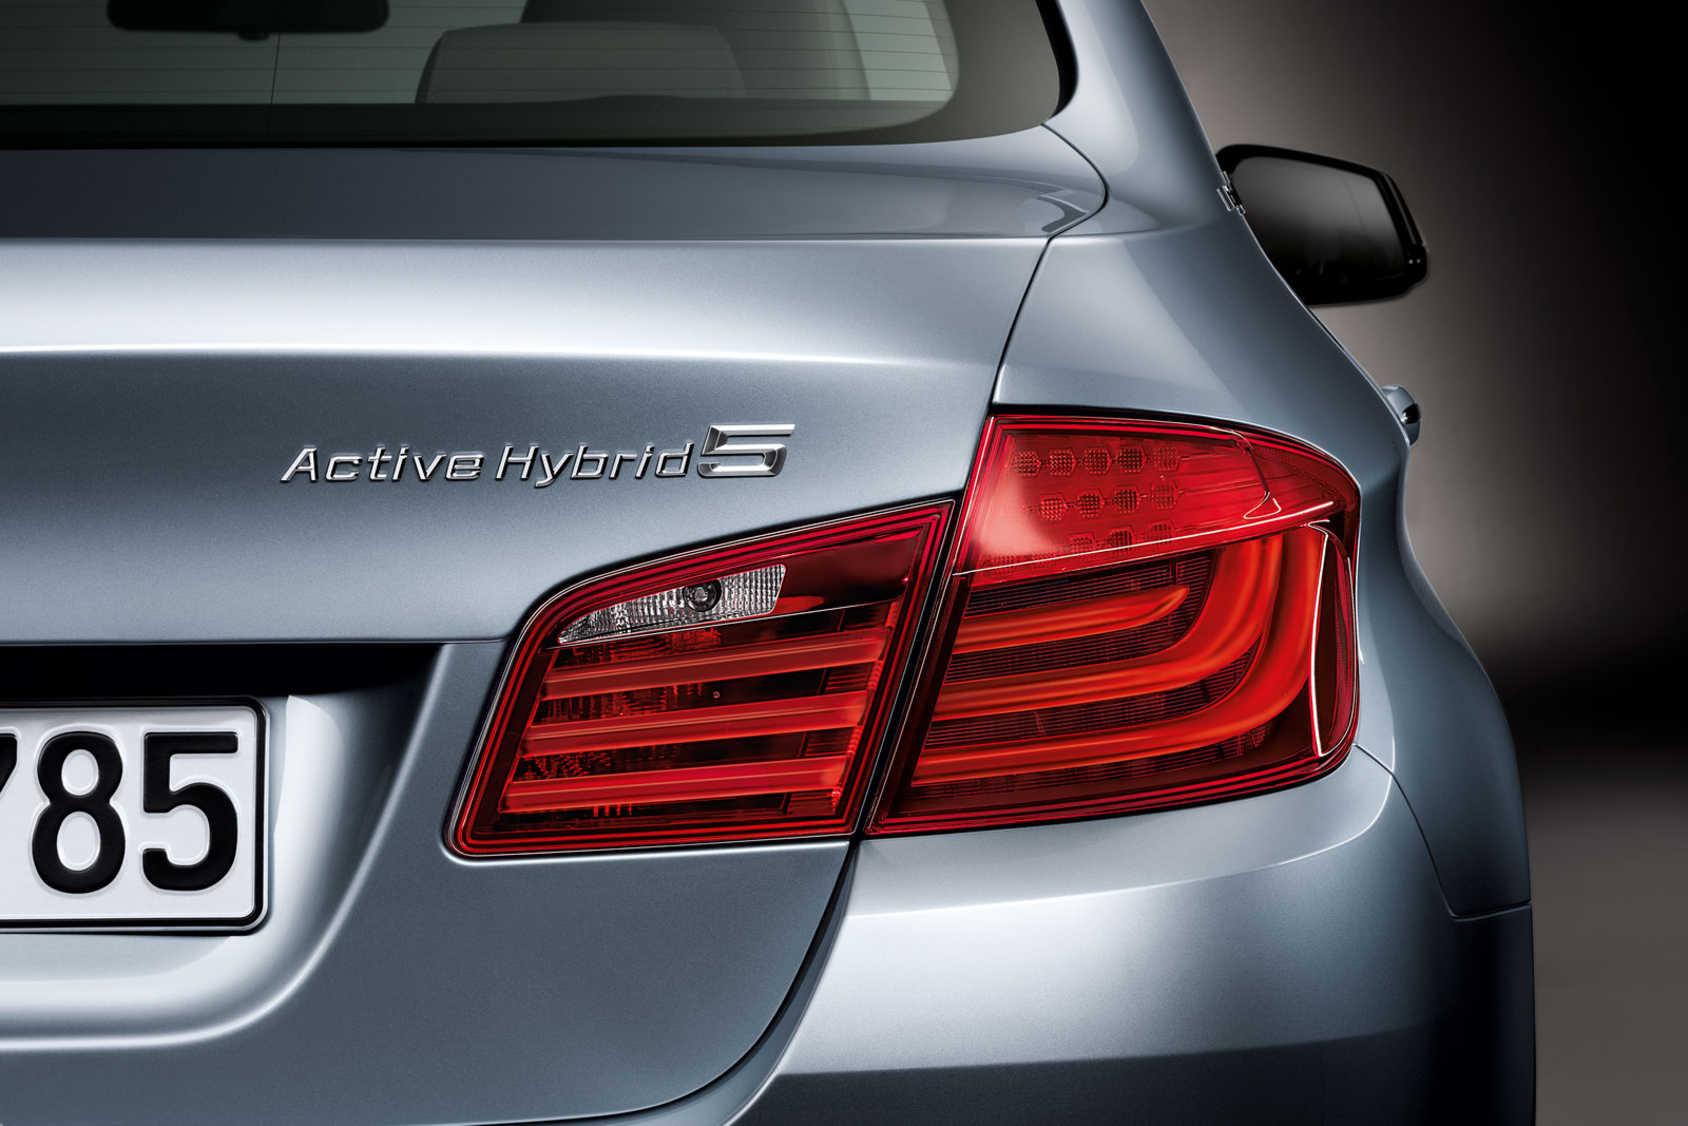 ActiveHybrid nu även till BMW:s 5-serie